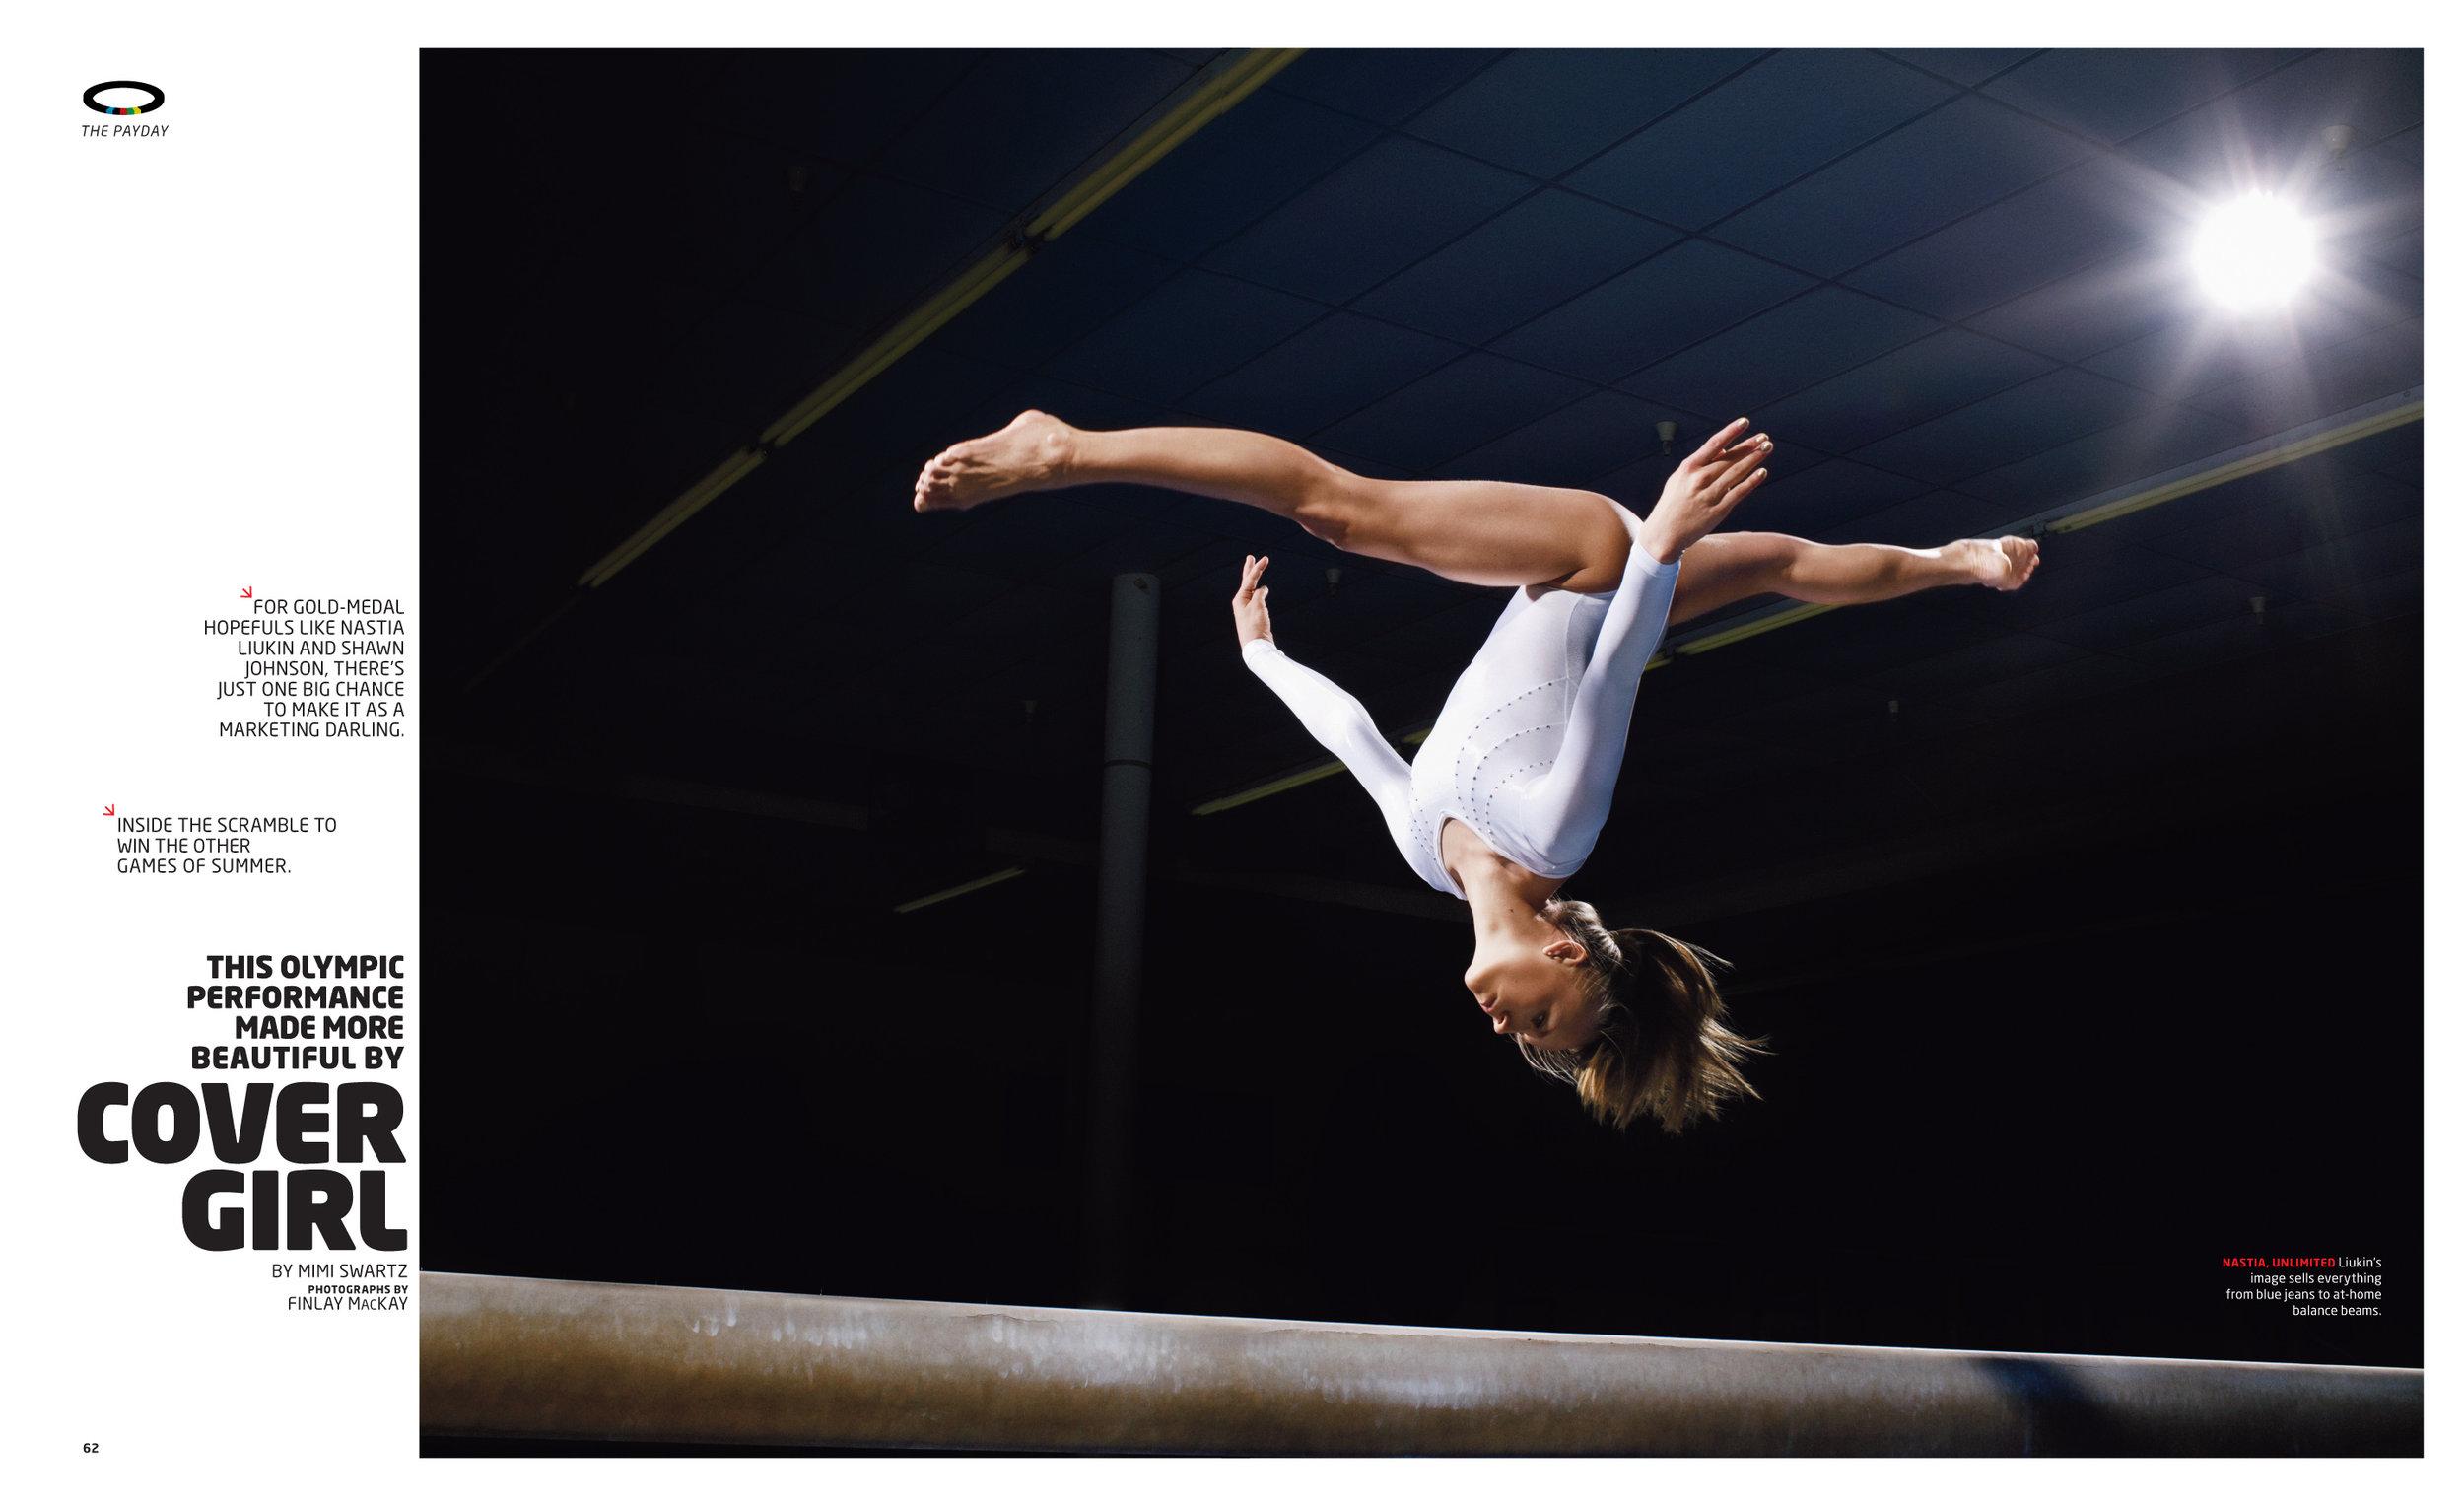 08.03.2008.Olympics.Liukin 1st Spread.jpg